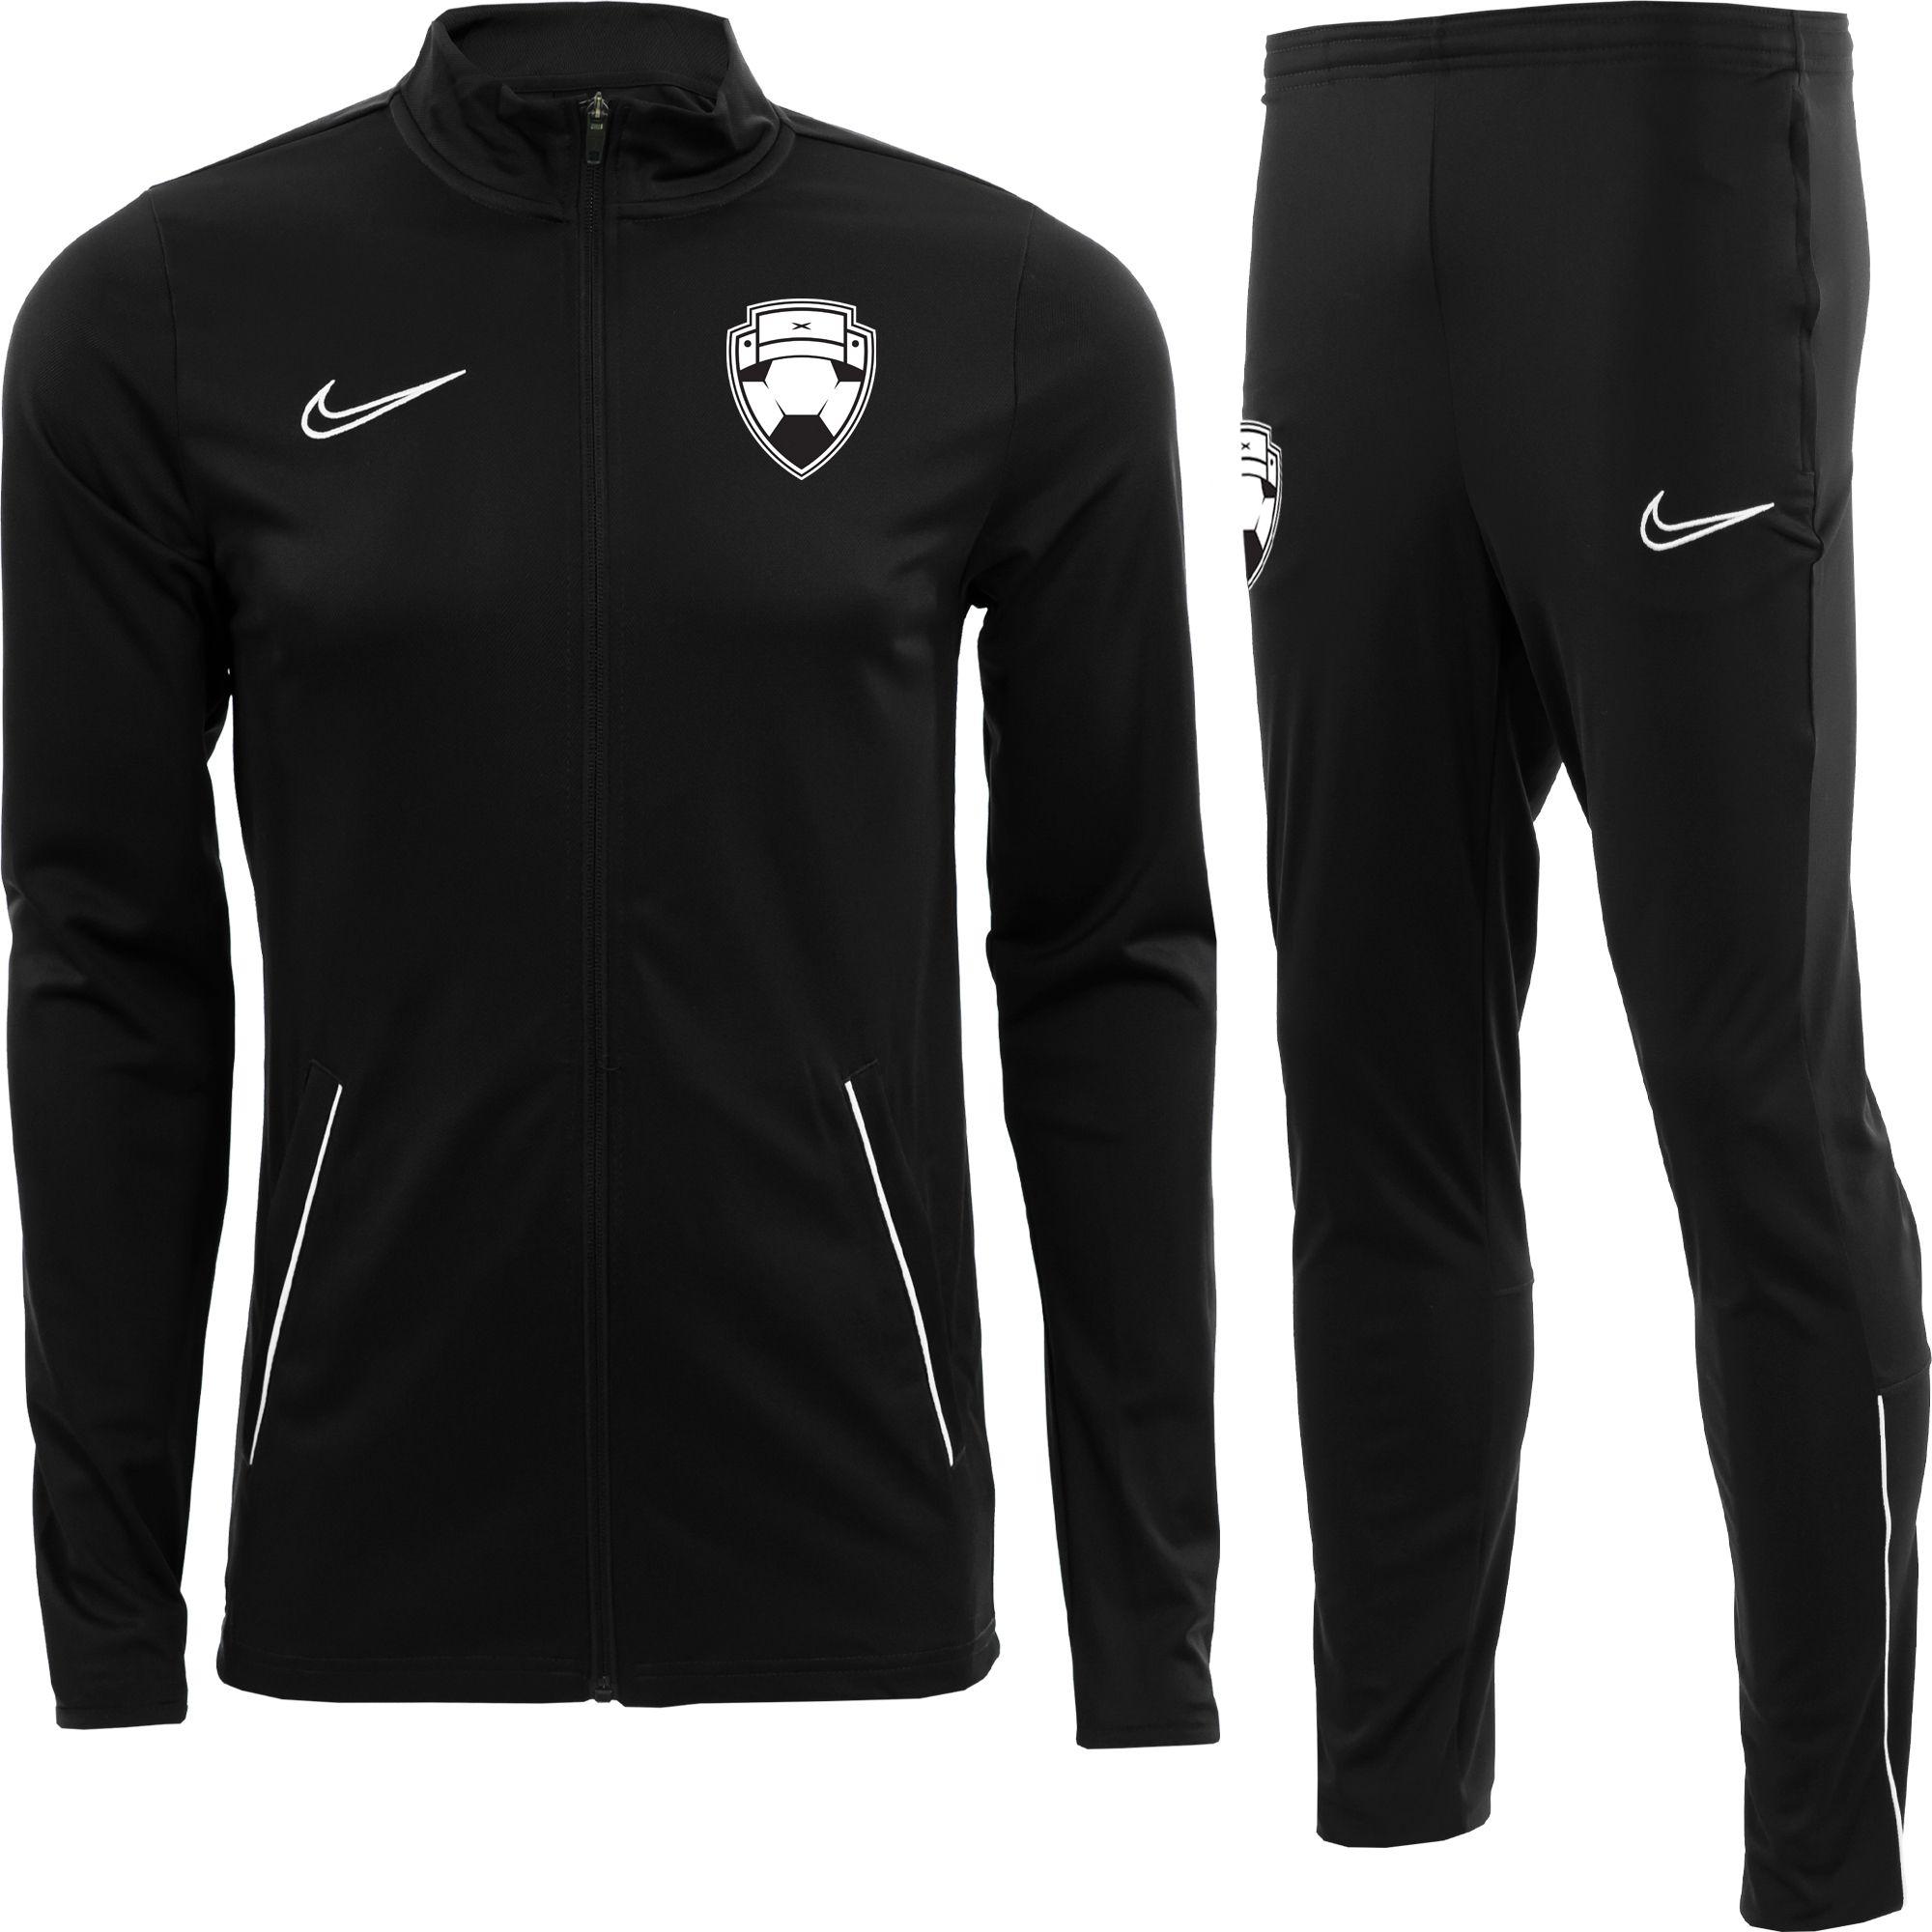 Nike Bankzitters Trainingspak Zwart Wit